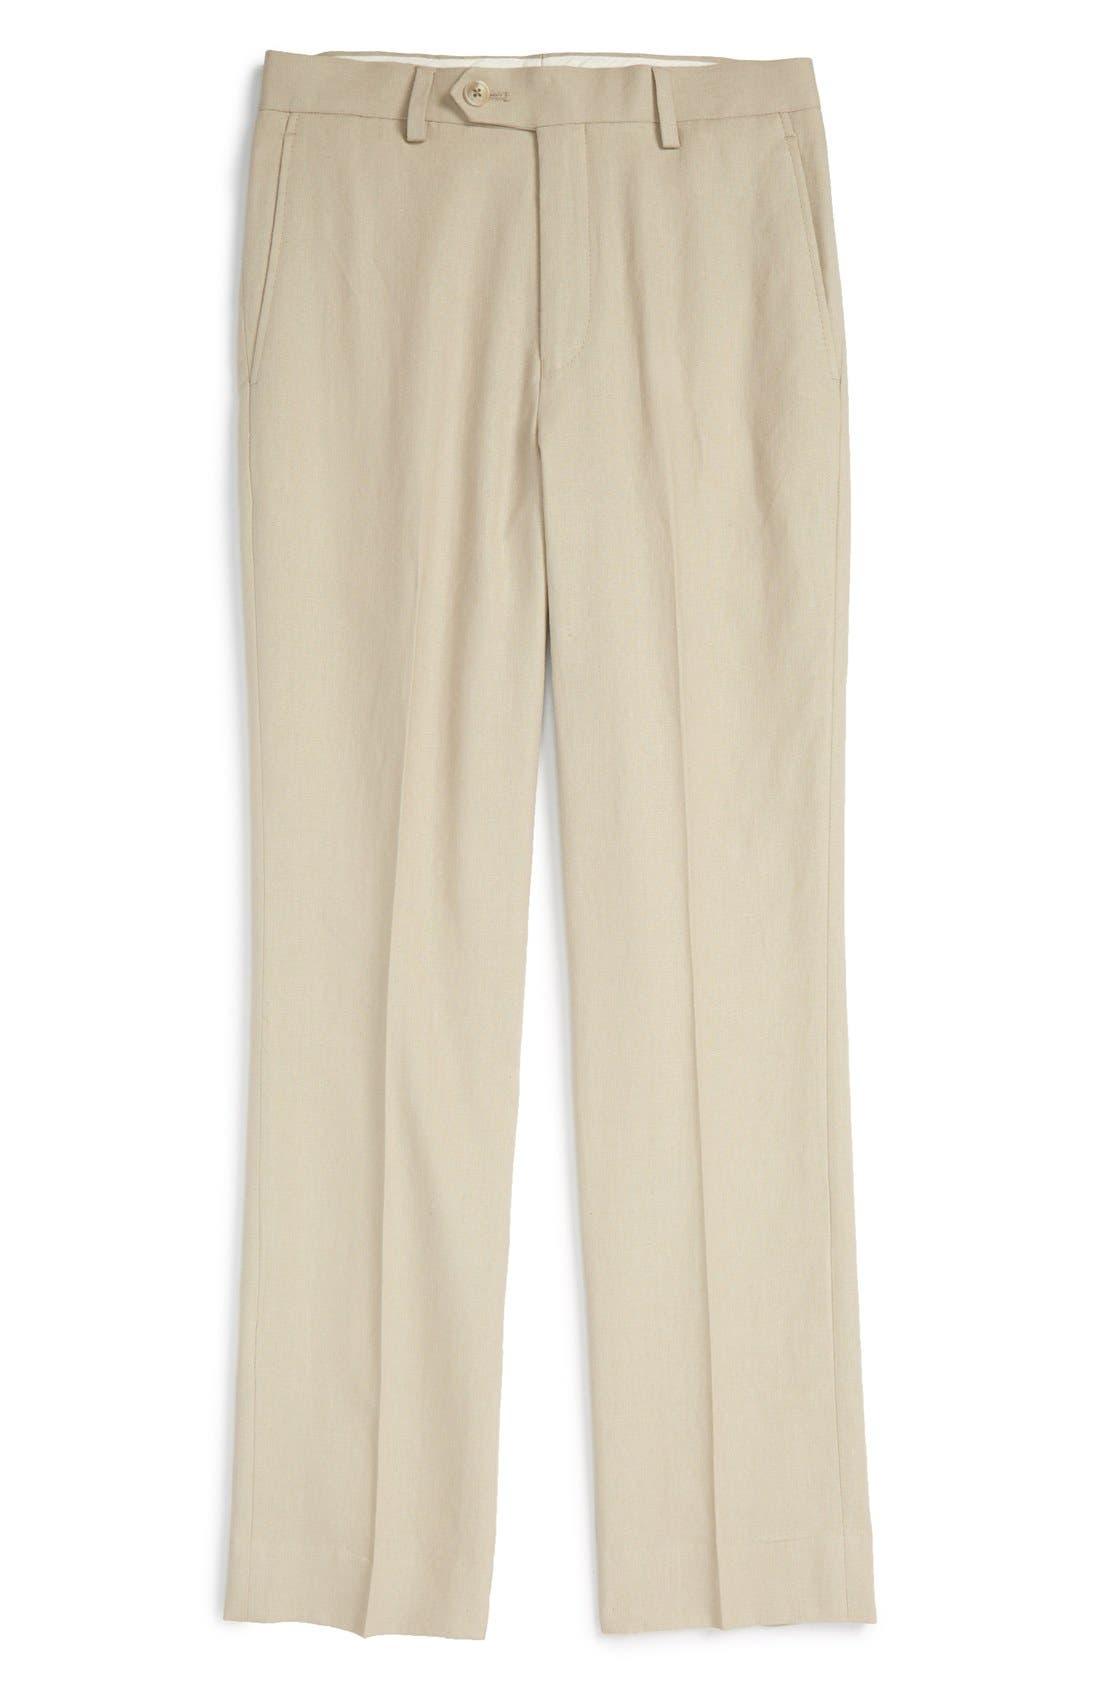 MICHAEL KORS Kirton Flat Front Linen Blend Trousers